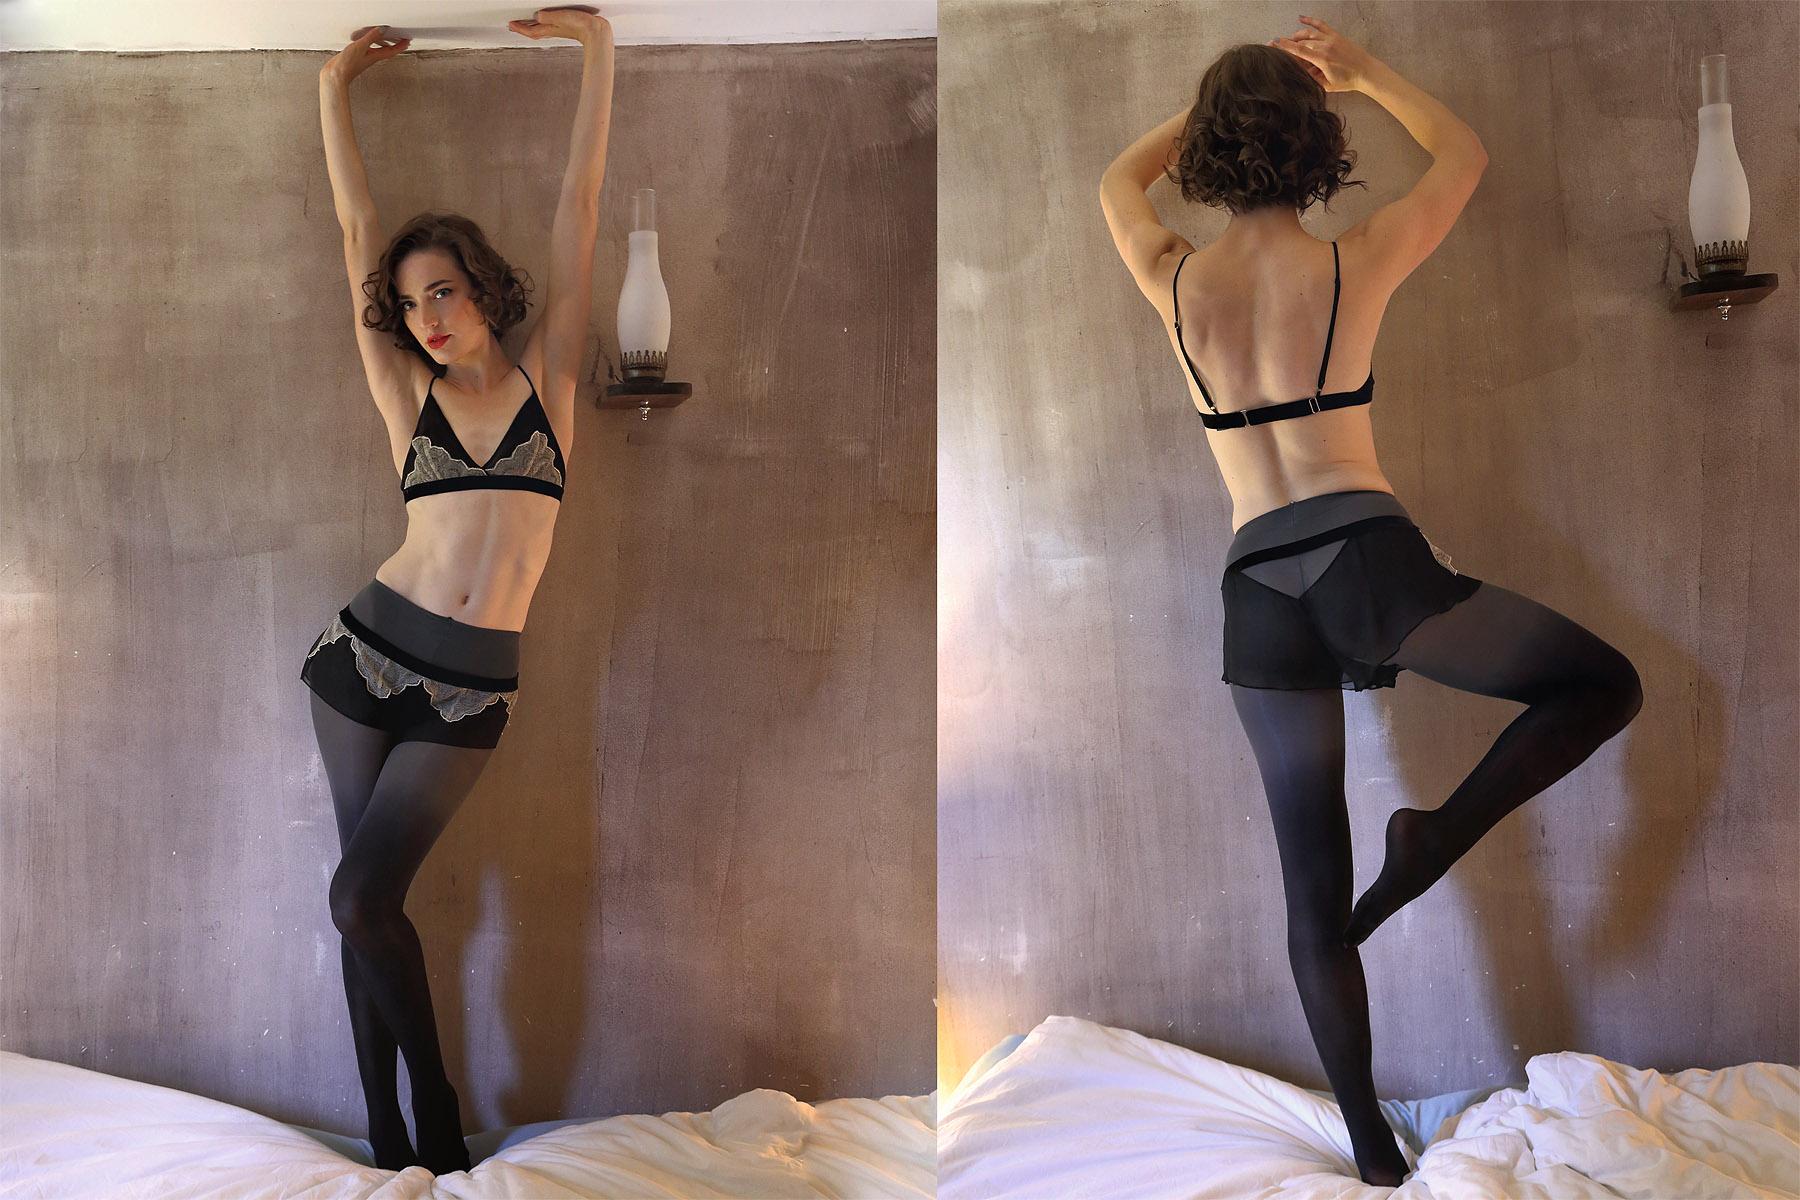 holiday-14-bts-lingerie-lookbook-arabesque-bra-black-grey-dip-dye-tights-bed-2.jpg